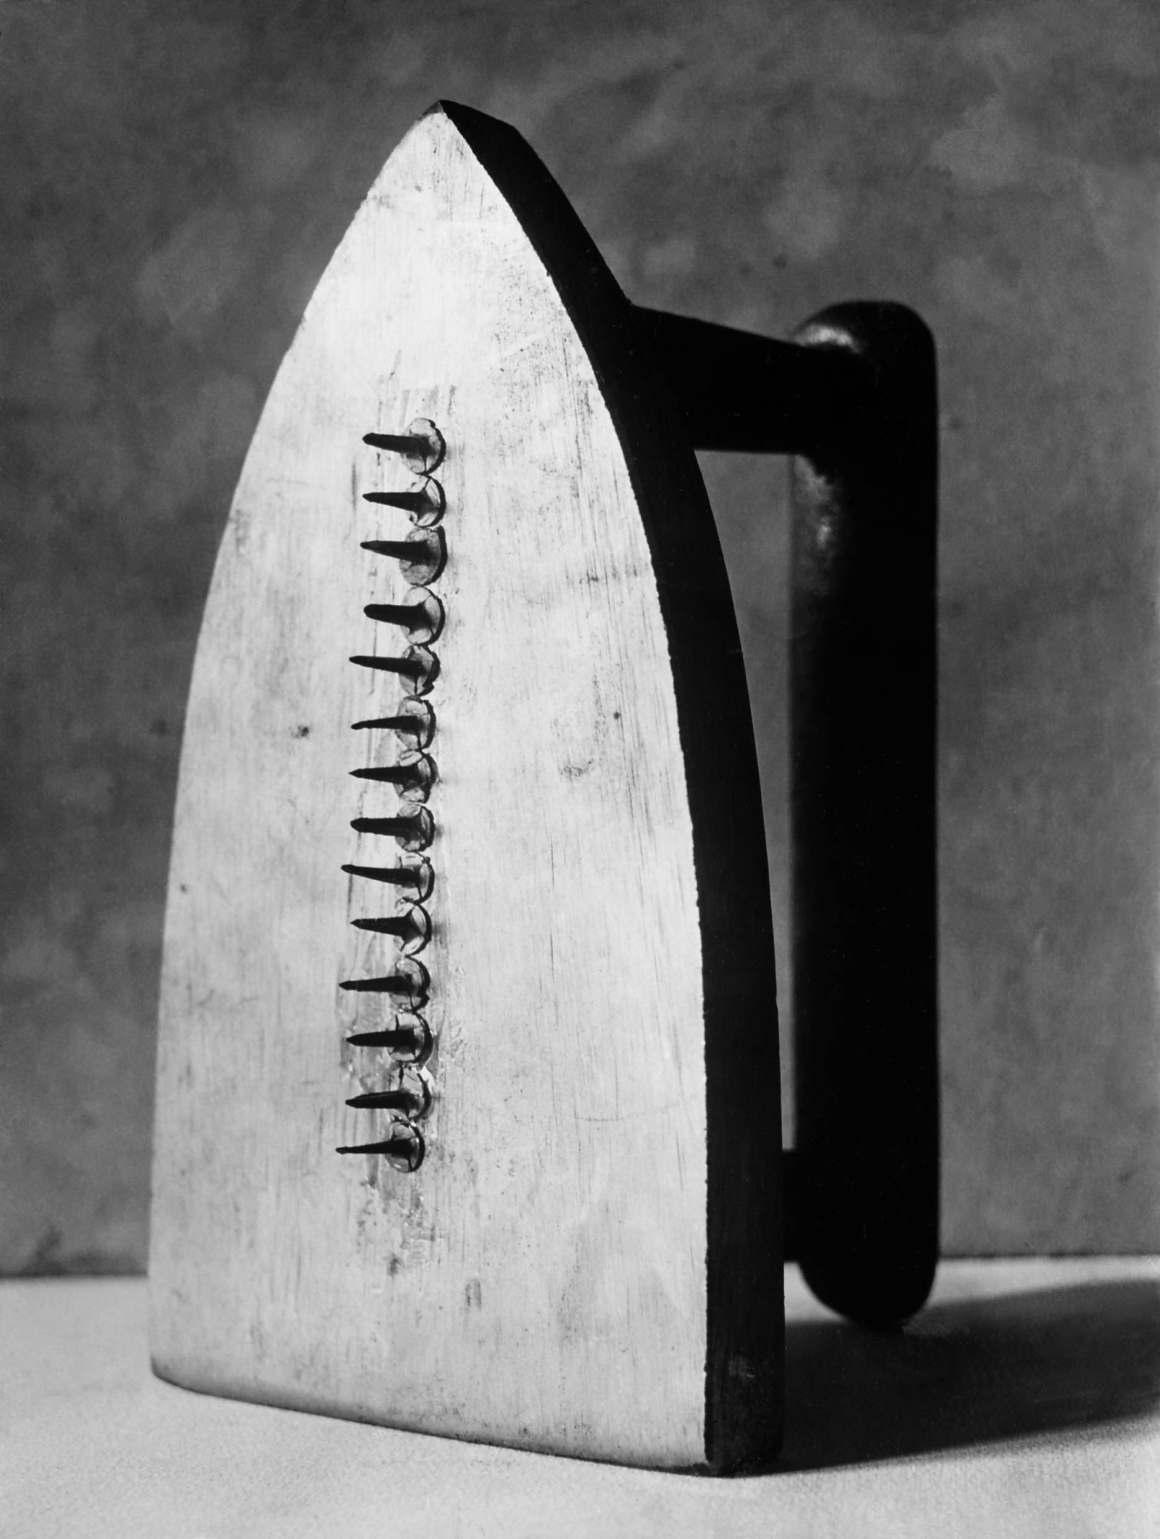 Les Champs délicieux 1922 Gelatin Silver print (Estate print) 30 X 24 cm © Man Ray Trust – ADAGP / courtesy MONDO GALERIA | TARQ